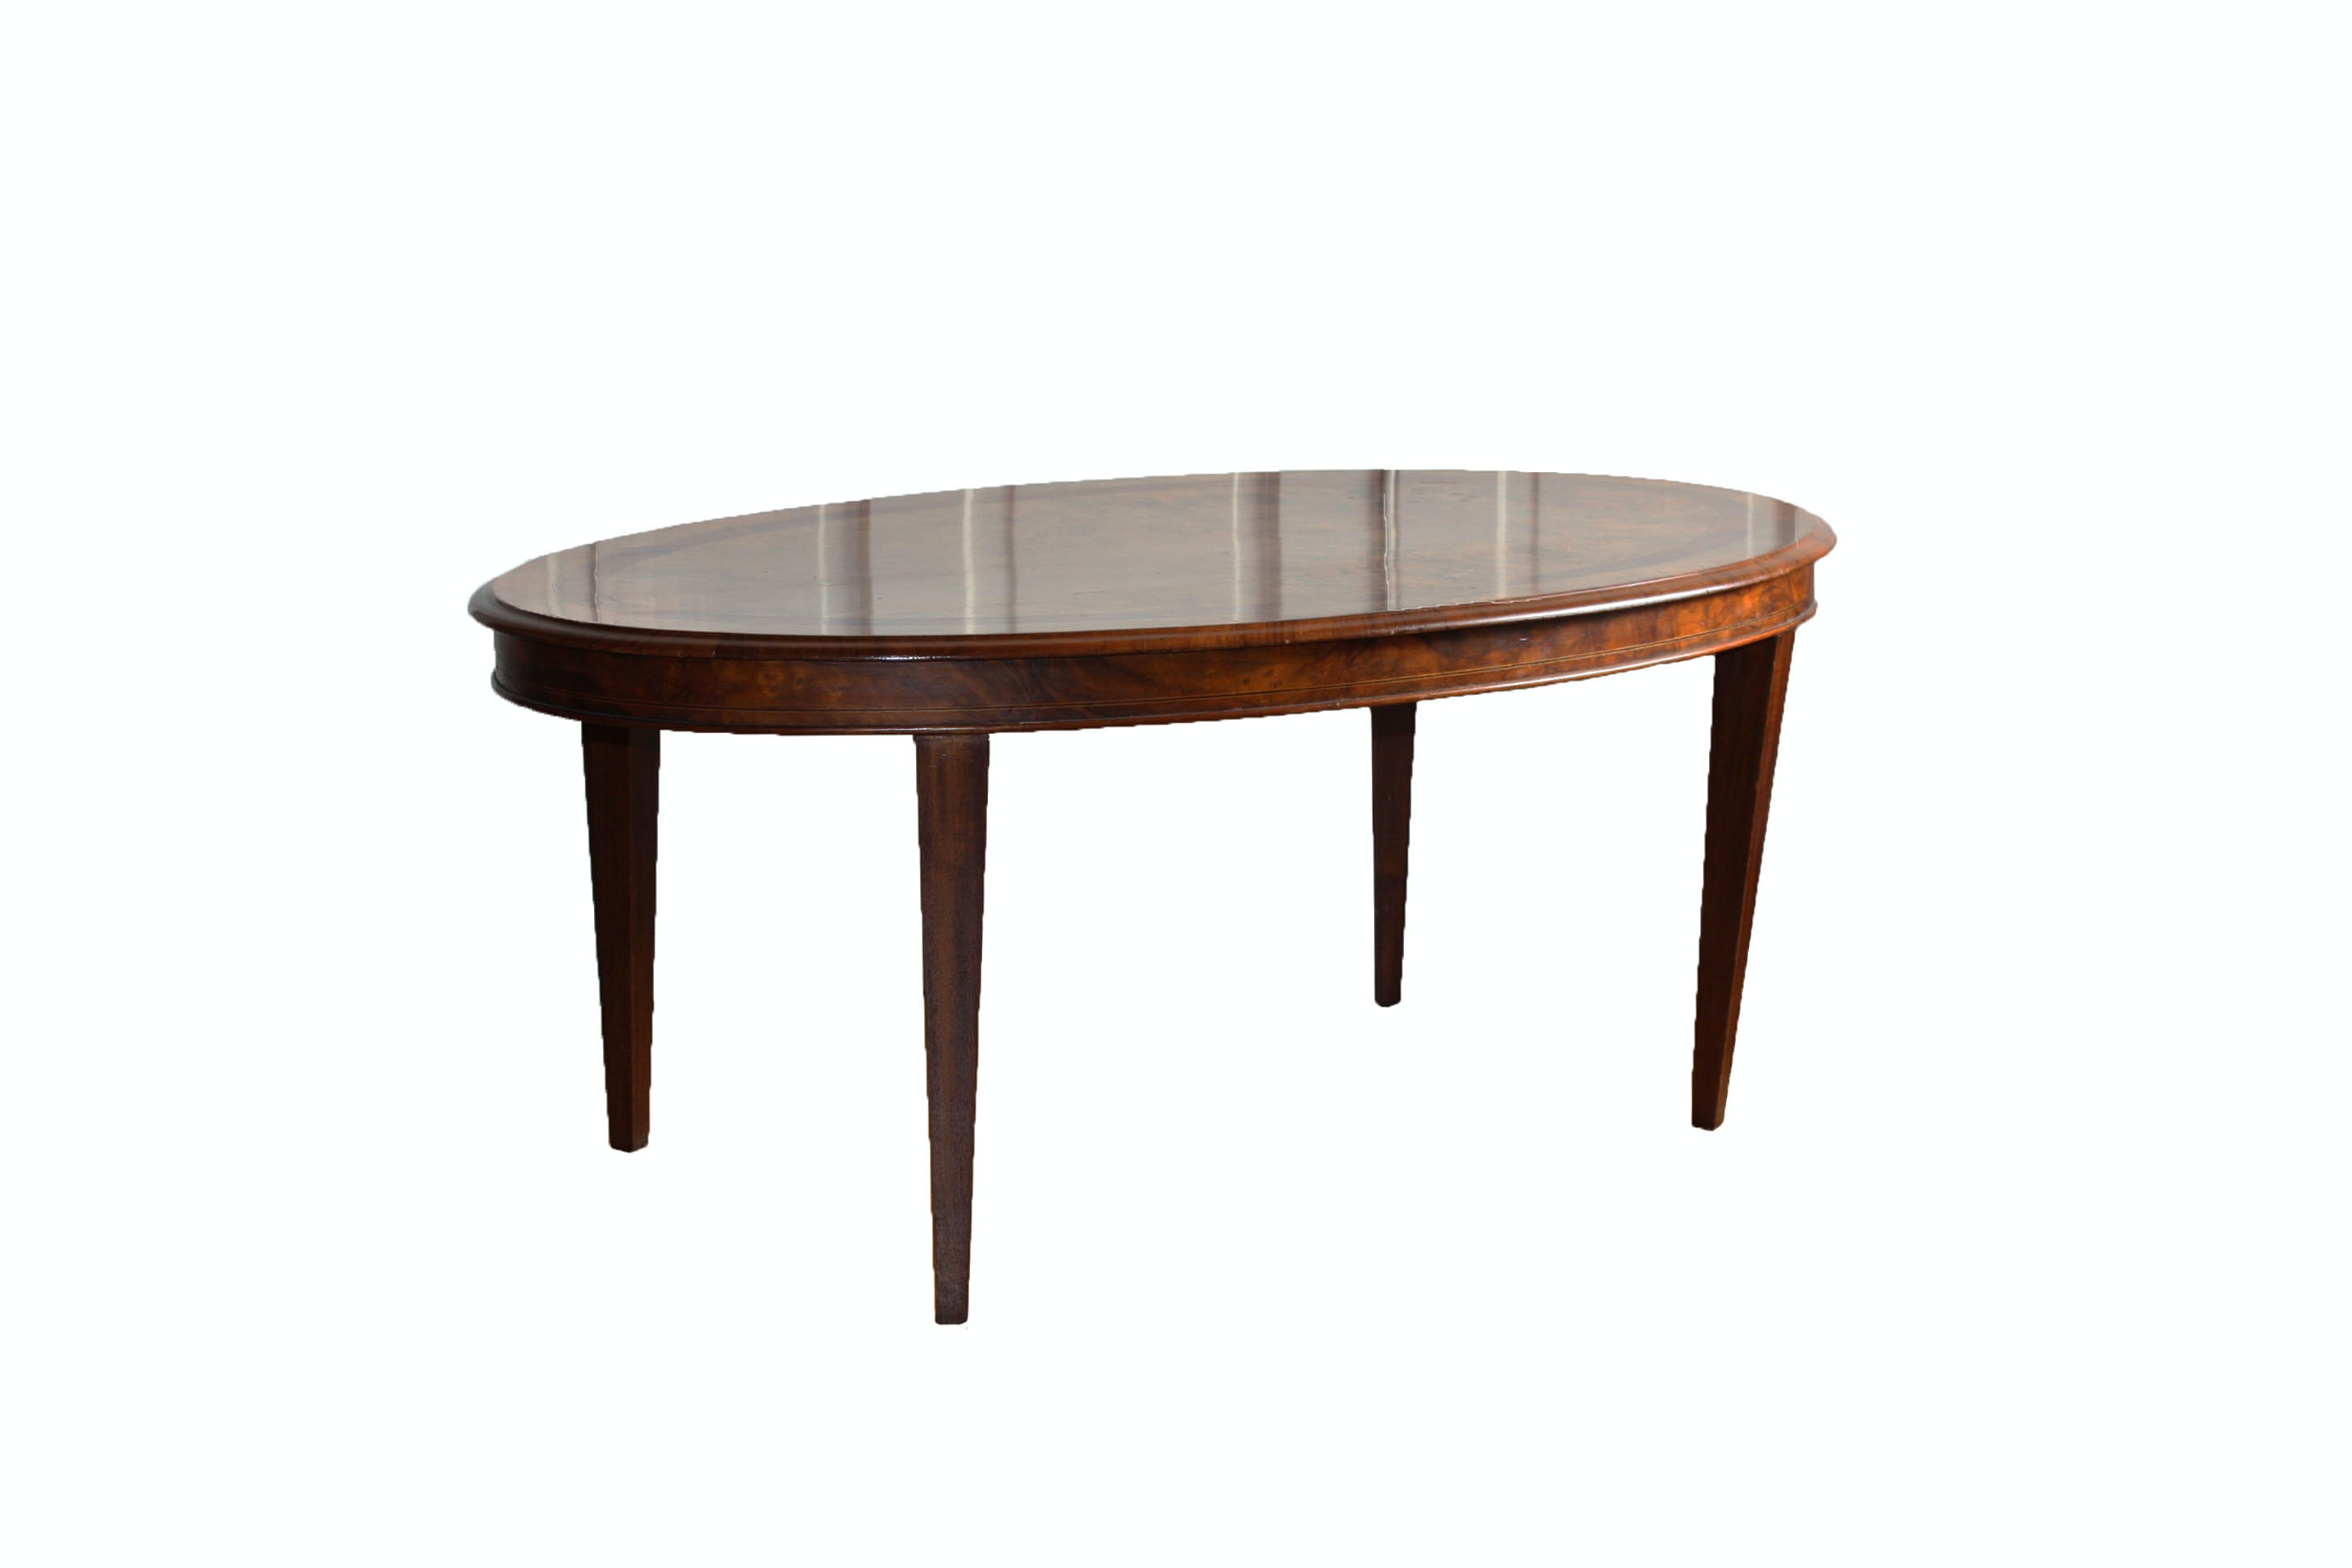 Oval Burl Walnut and Inlaid  Coffee Table